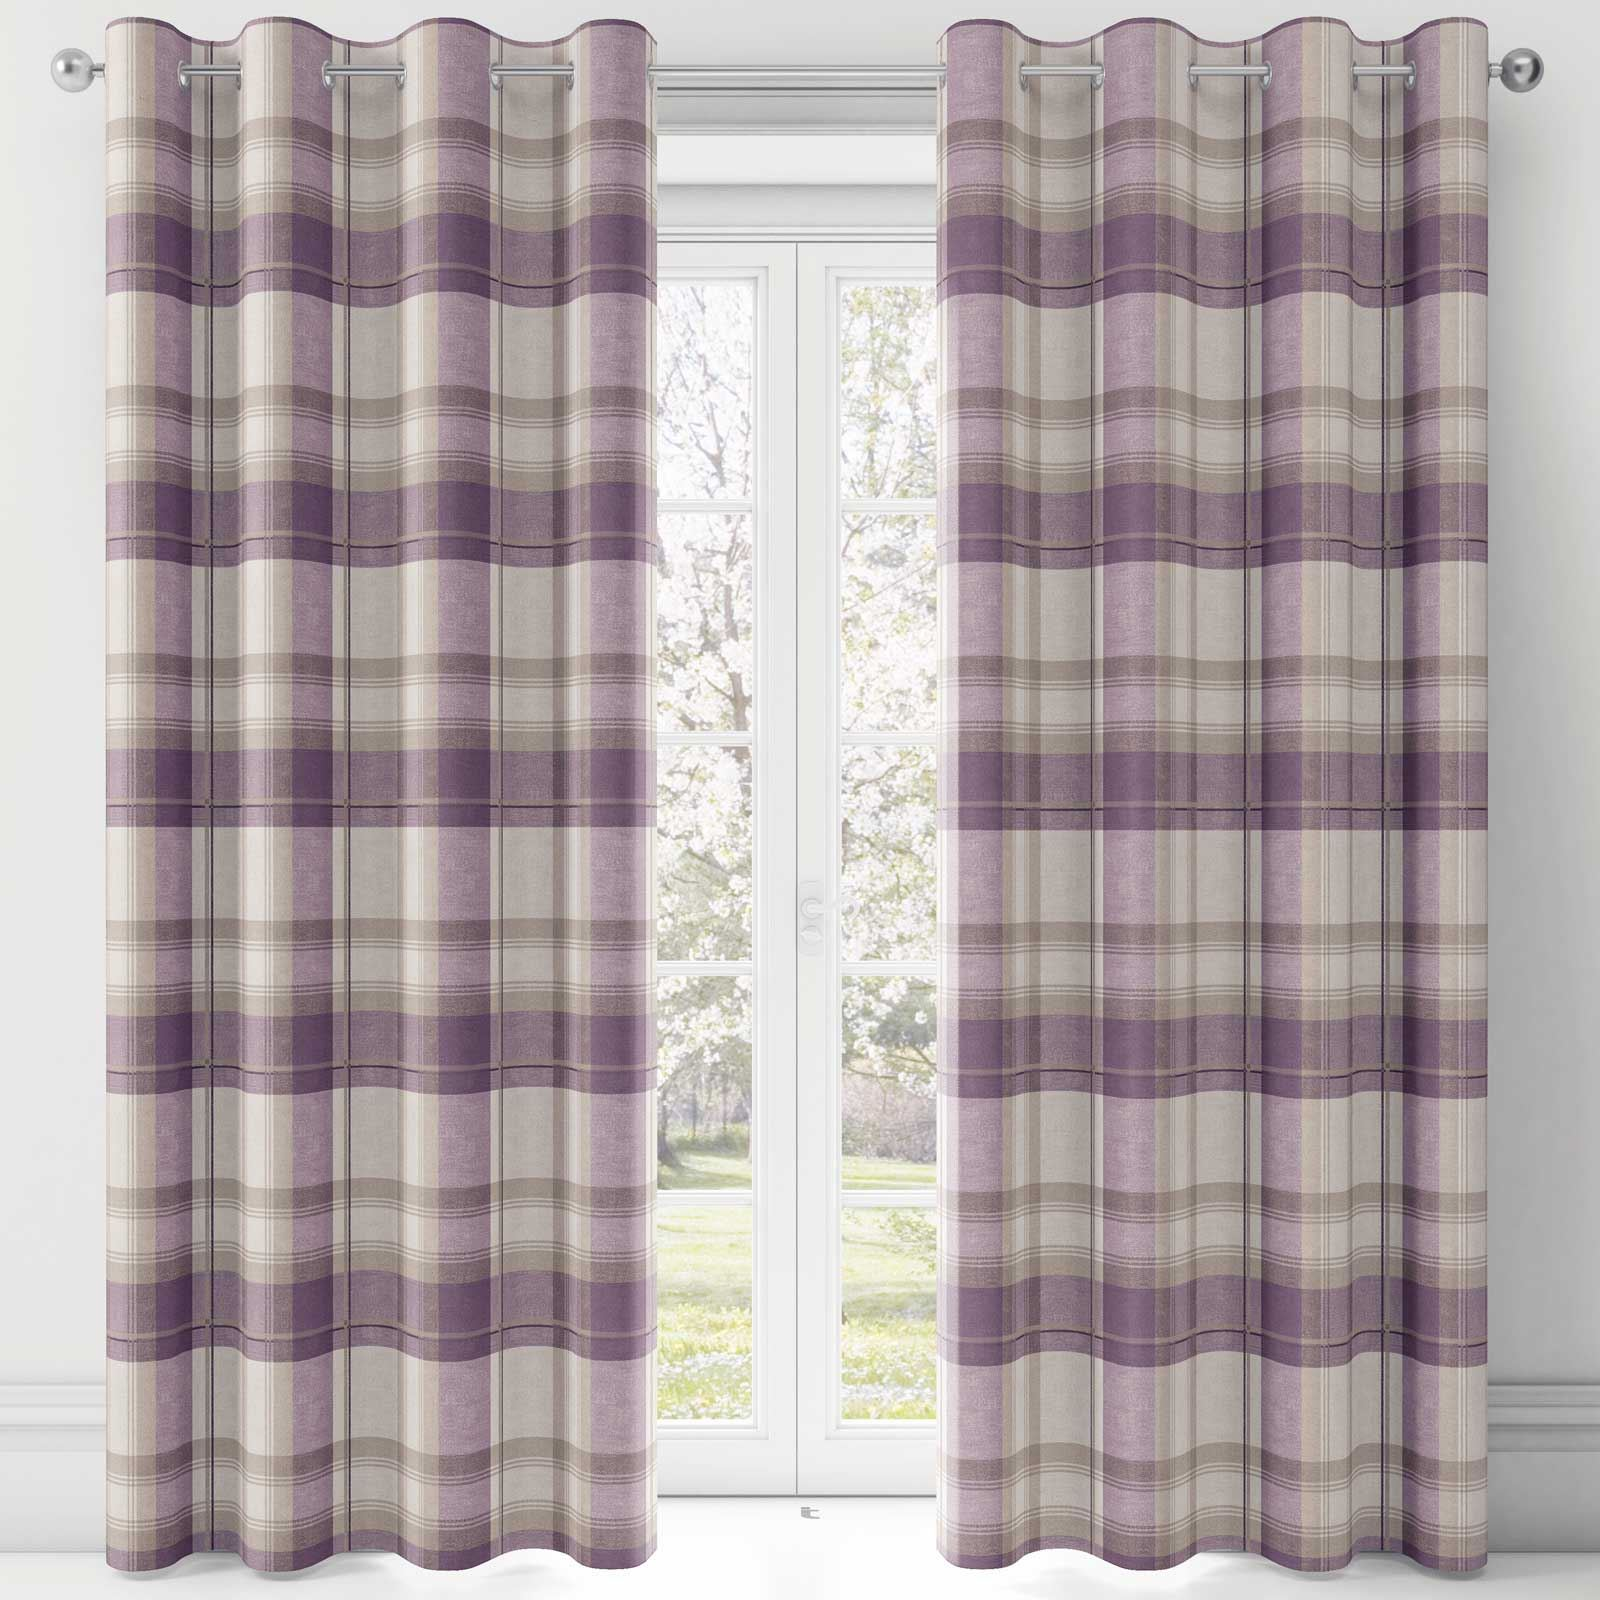 Purple Eyelet Curtains Balmoral Tartan Check Plum Lined